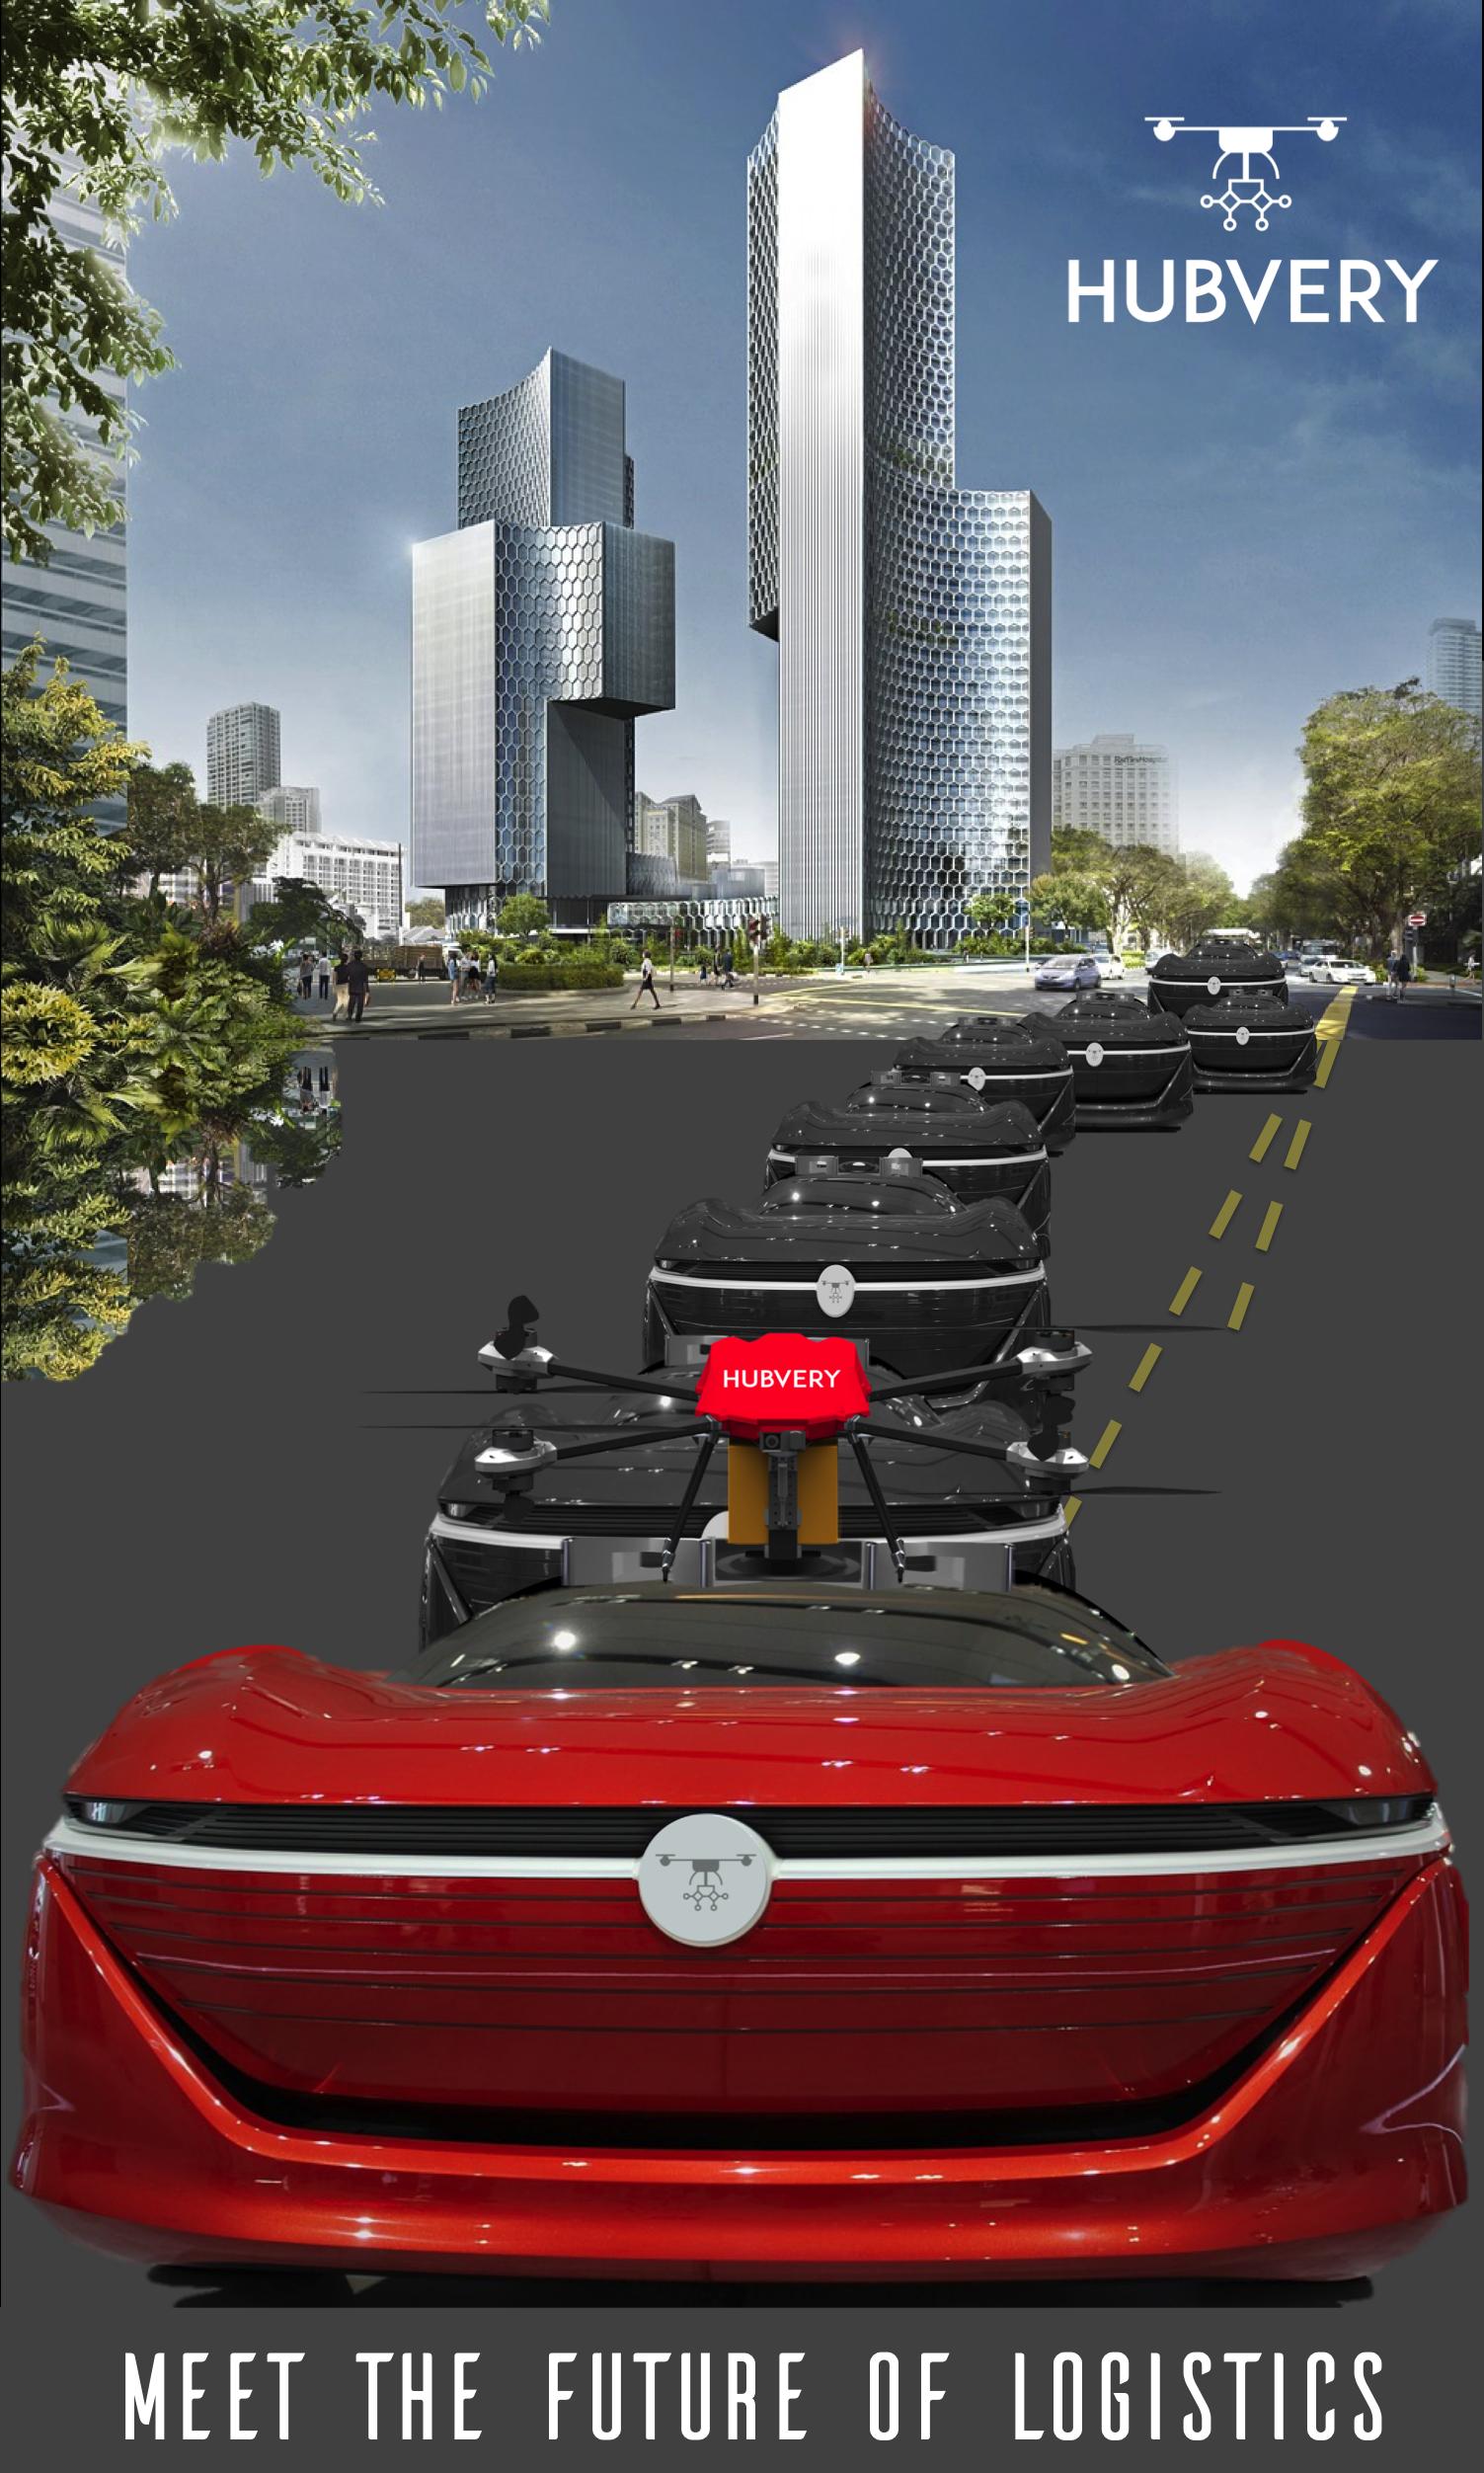 Meet the future of Logistics